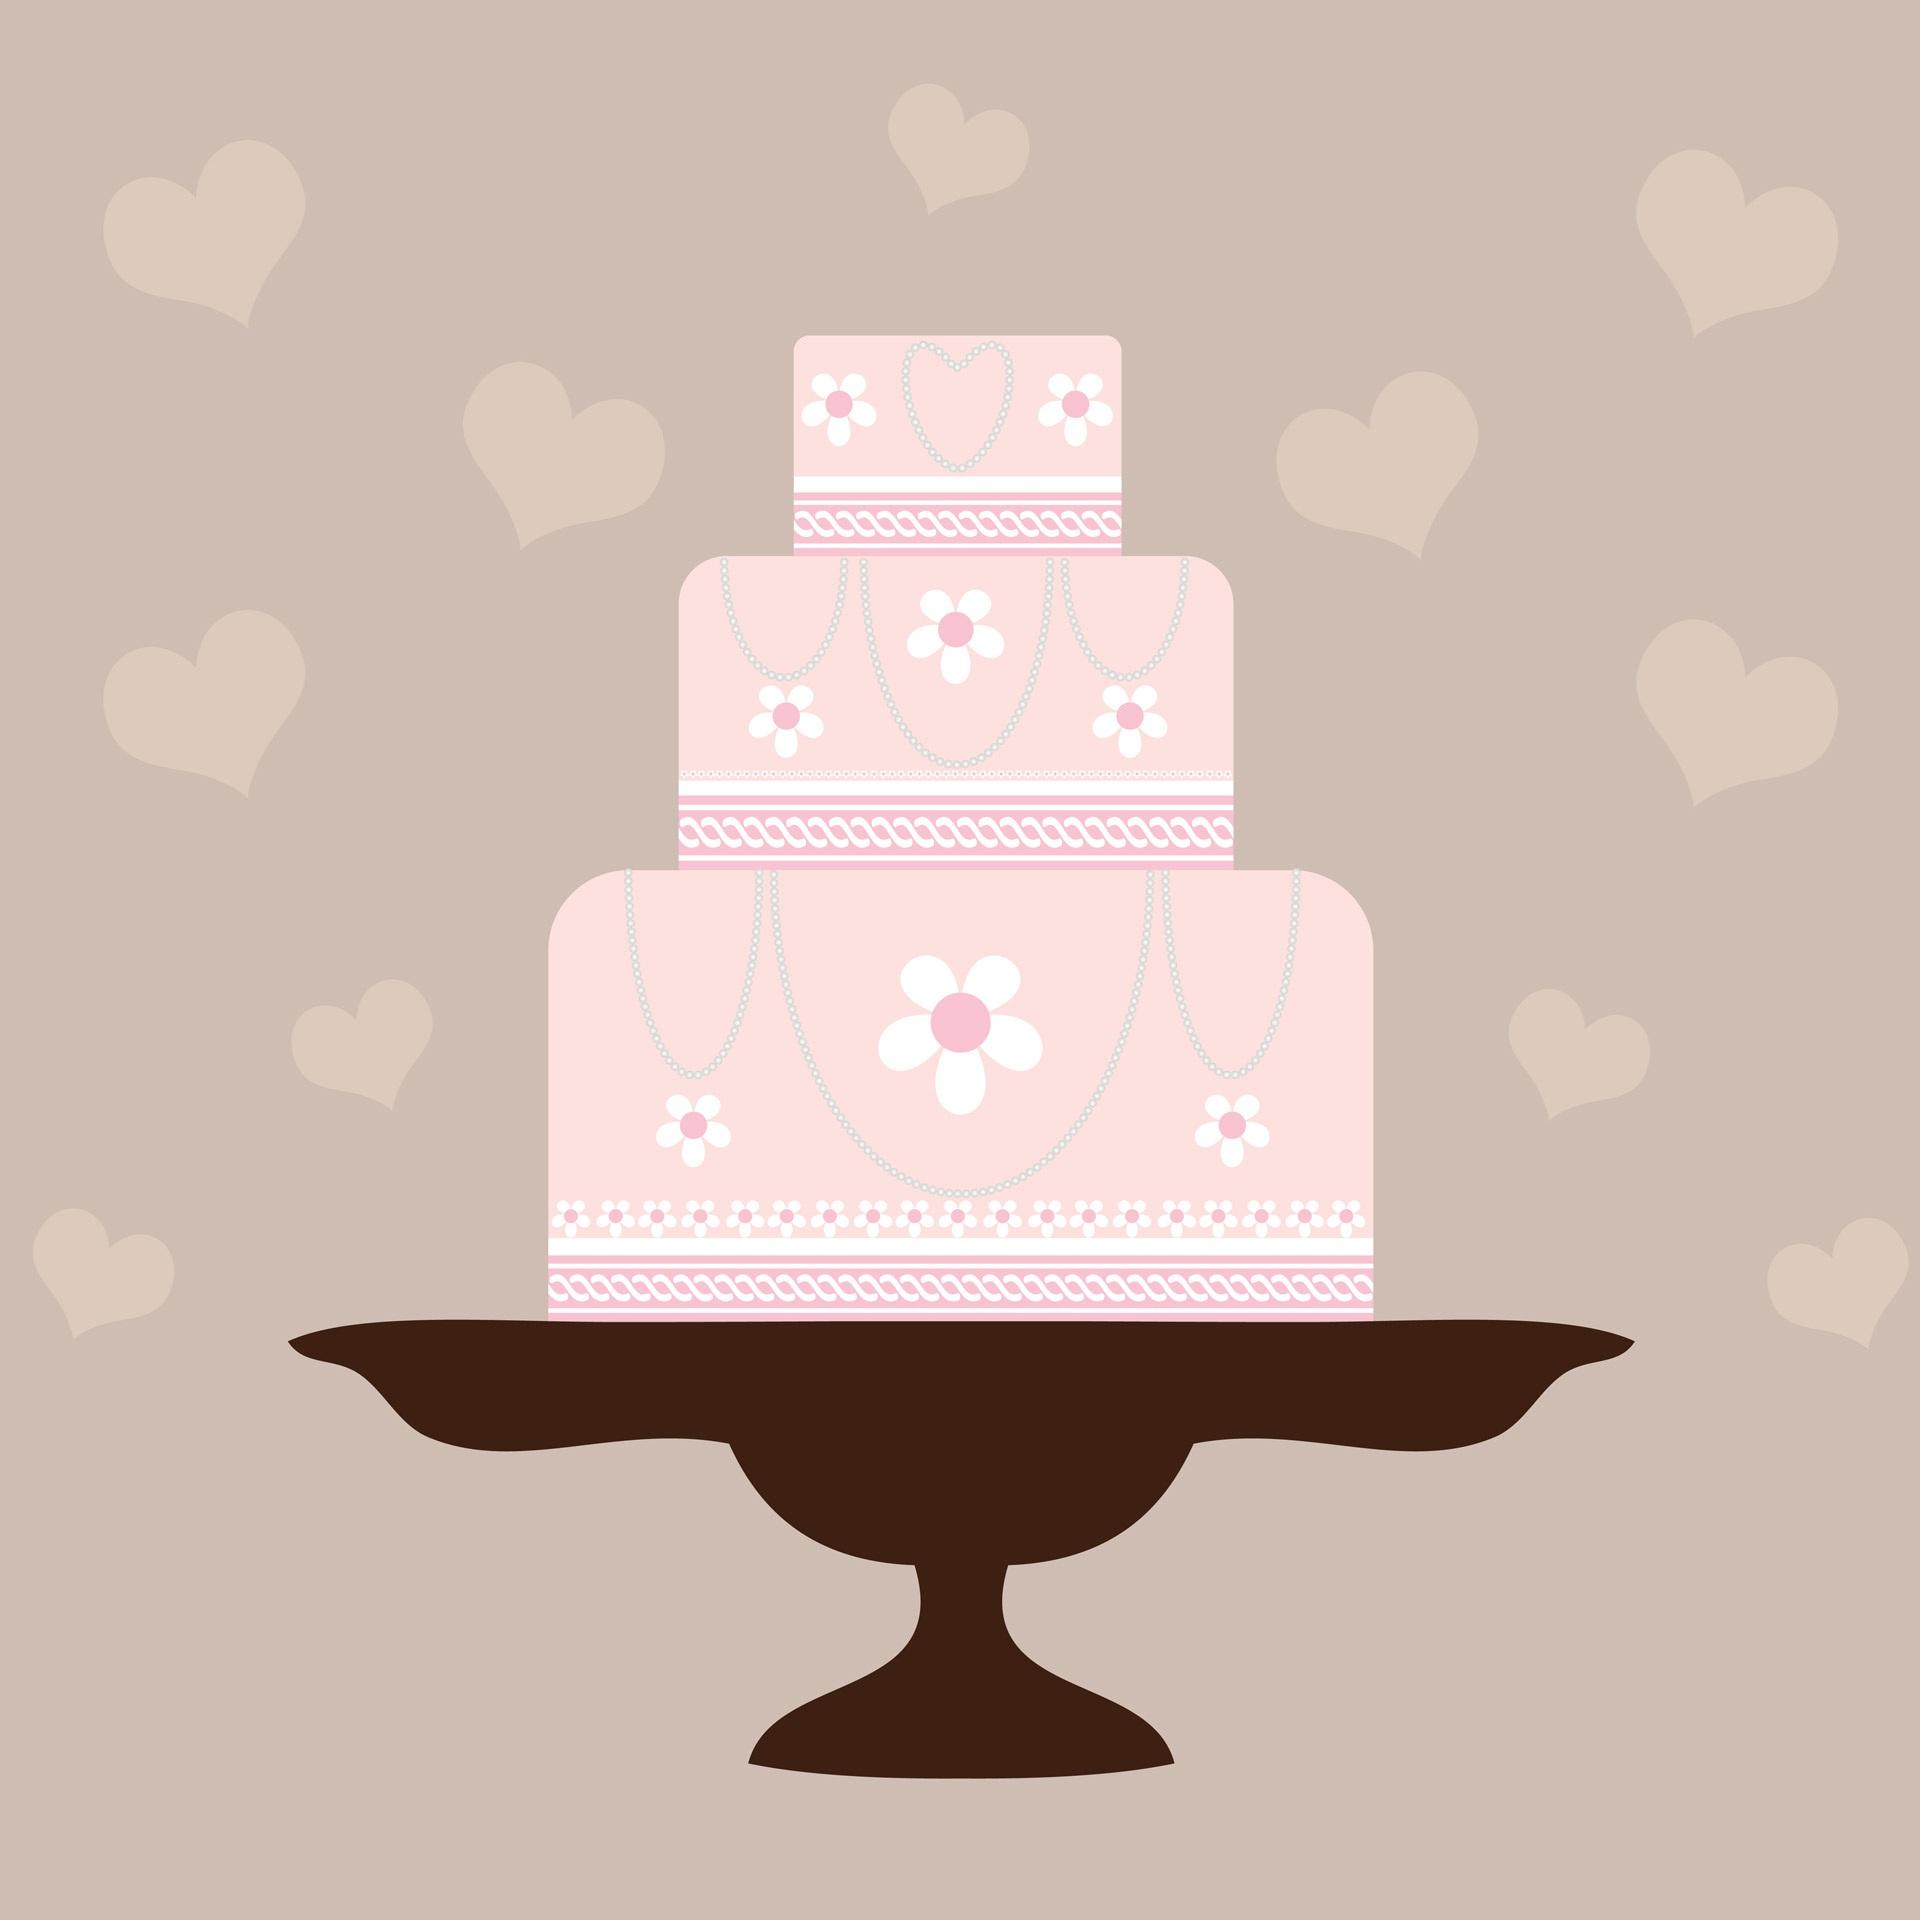 free images sweet cute celebration decoration